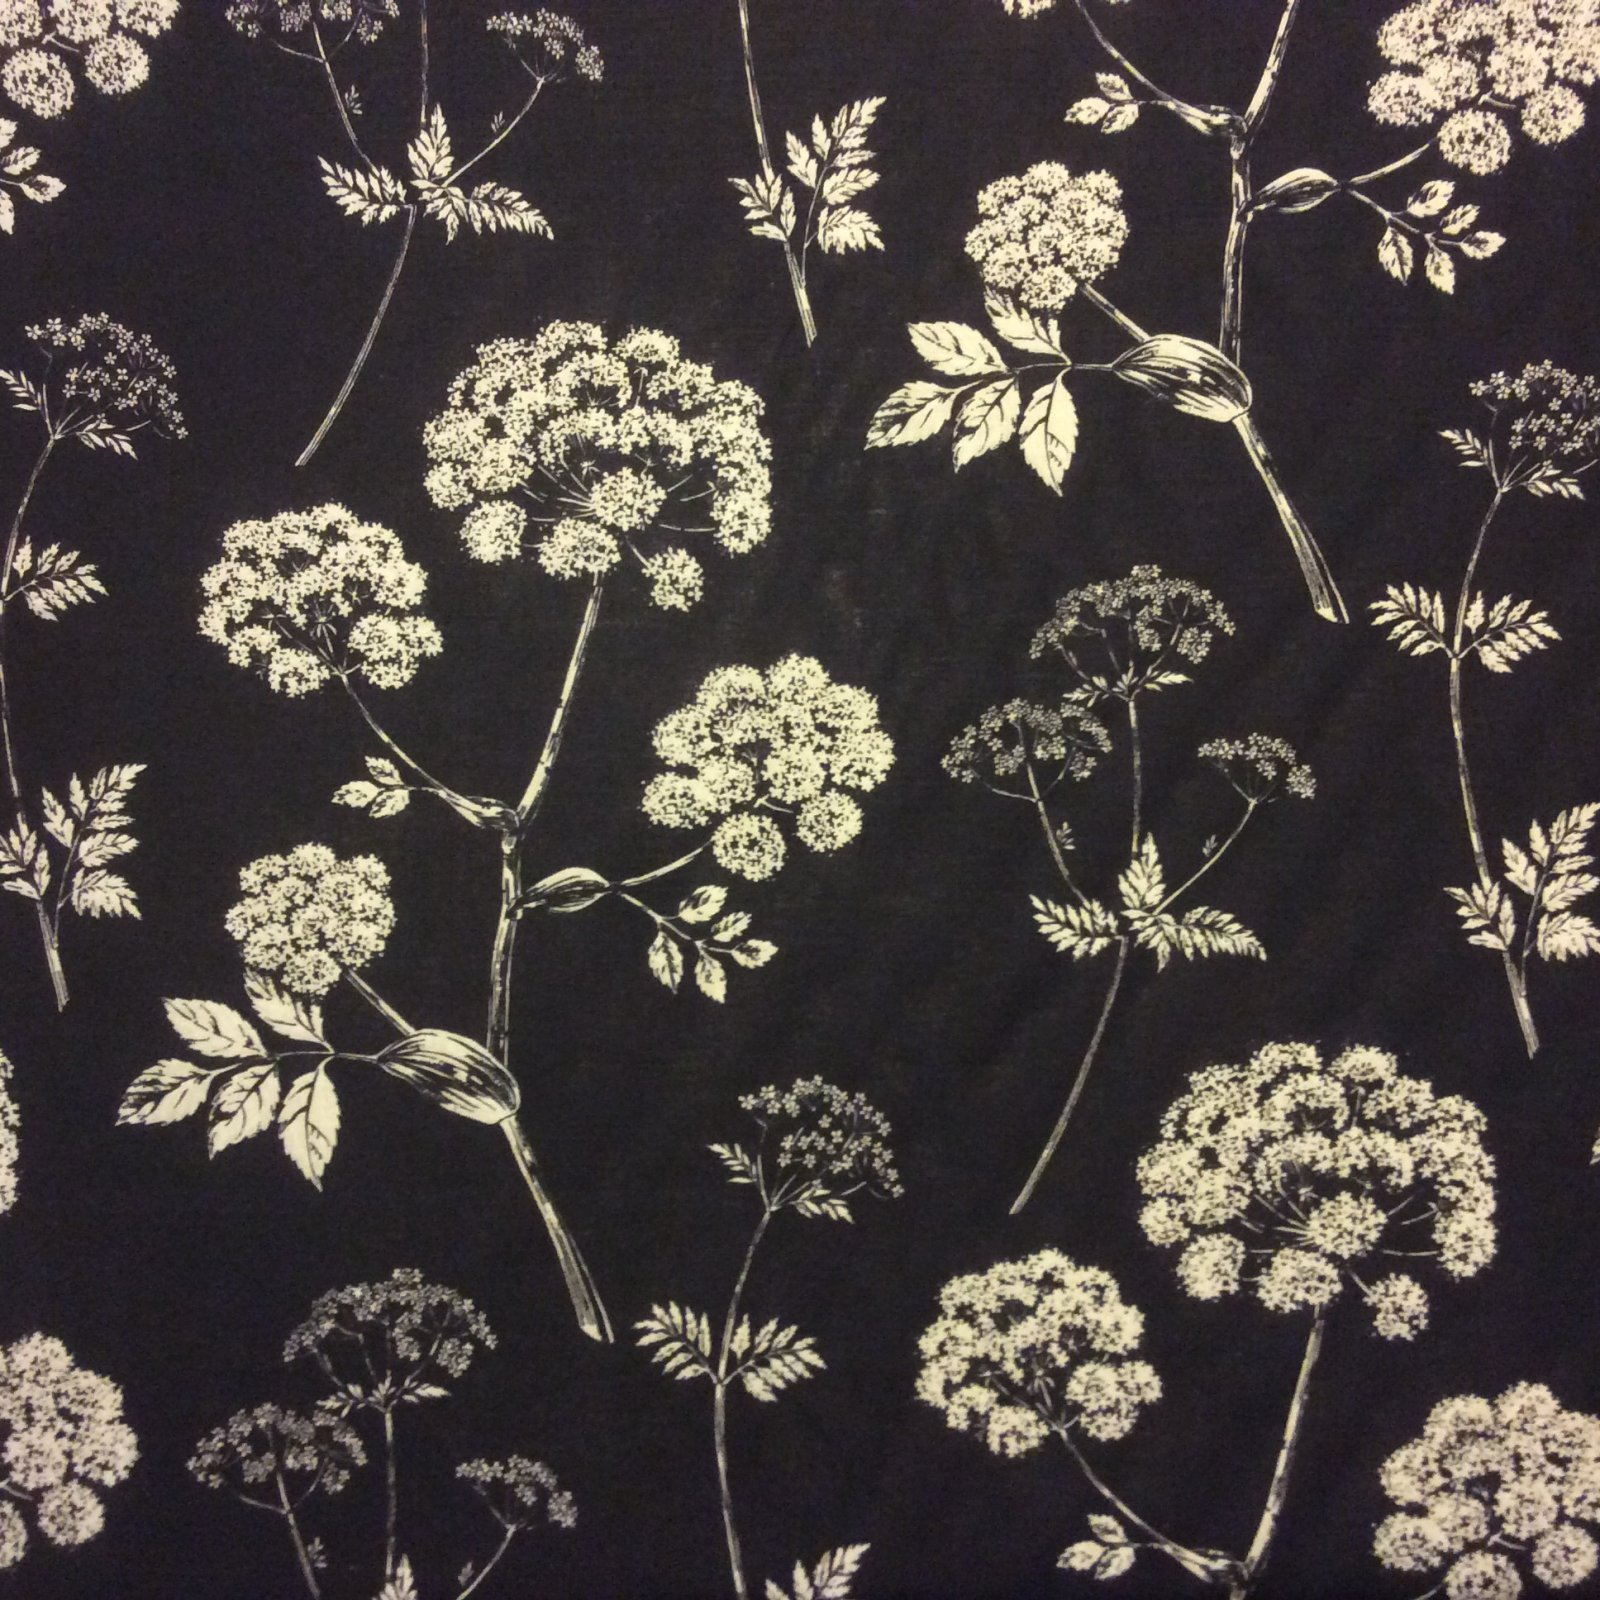 Beacon Hill Queen Anne's Lace Linen Floral Silouhette Fabric HD685